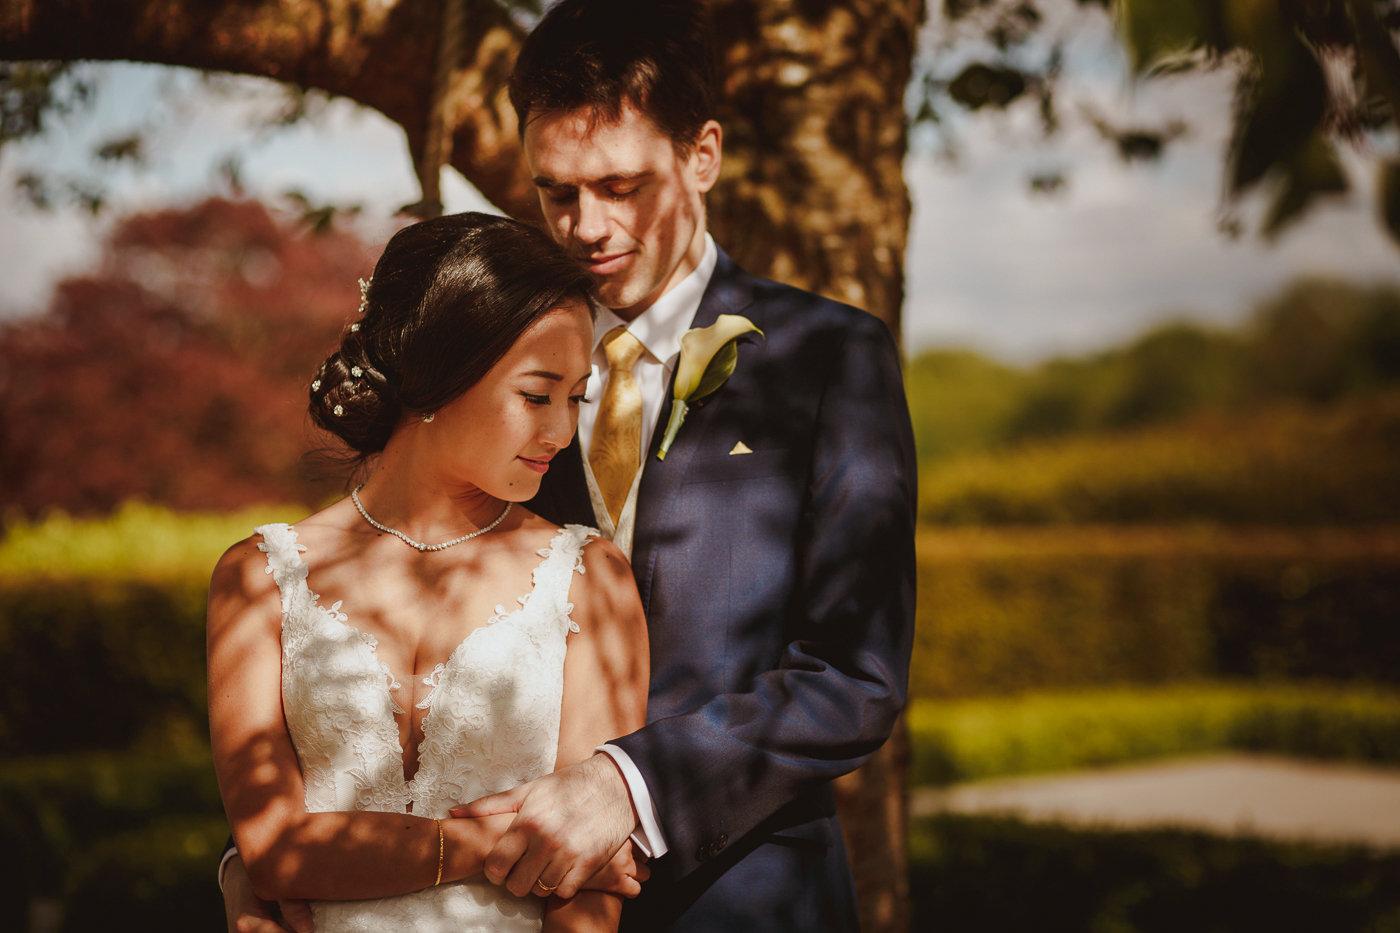 froyle-park-wedding-photography-33.jpg